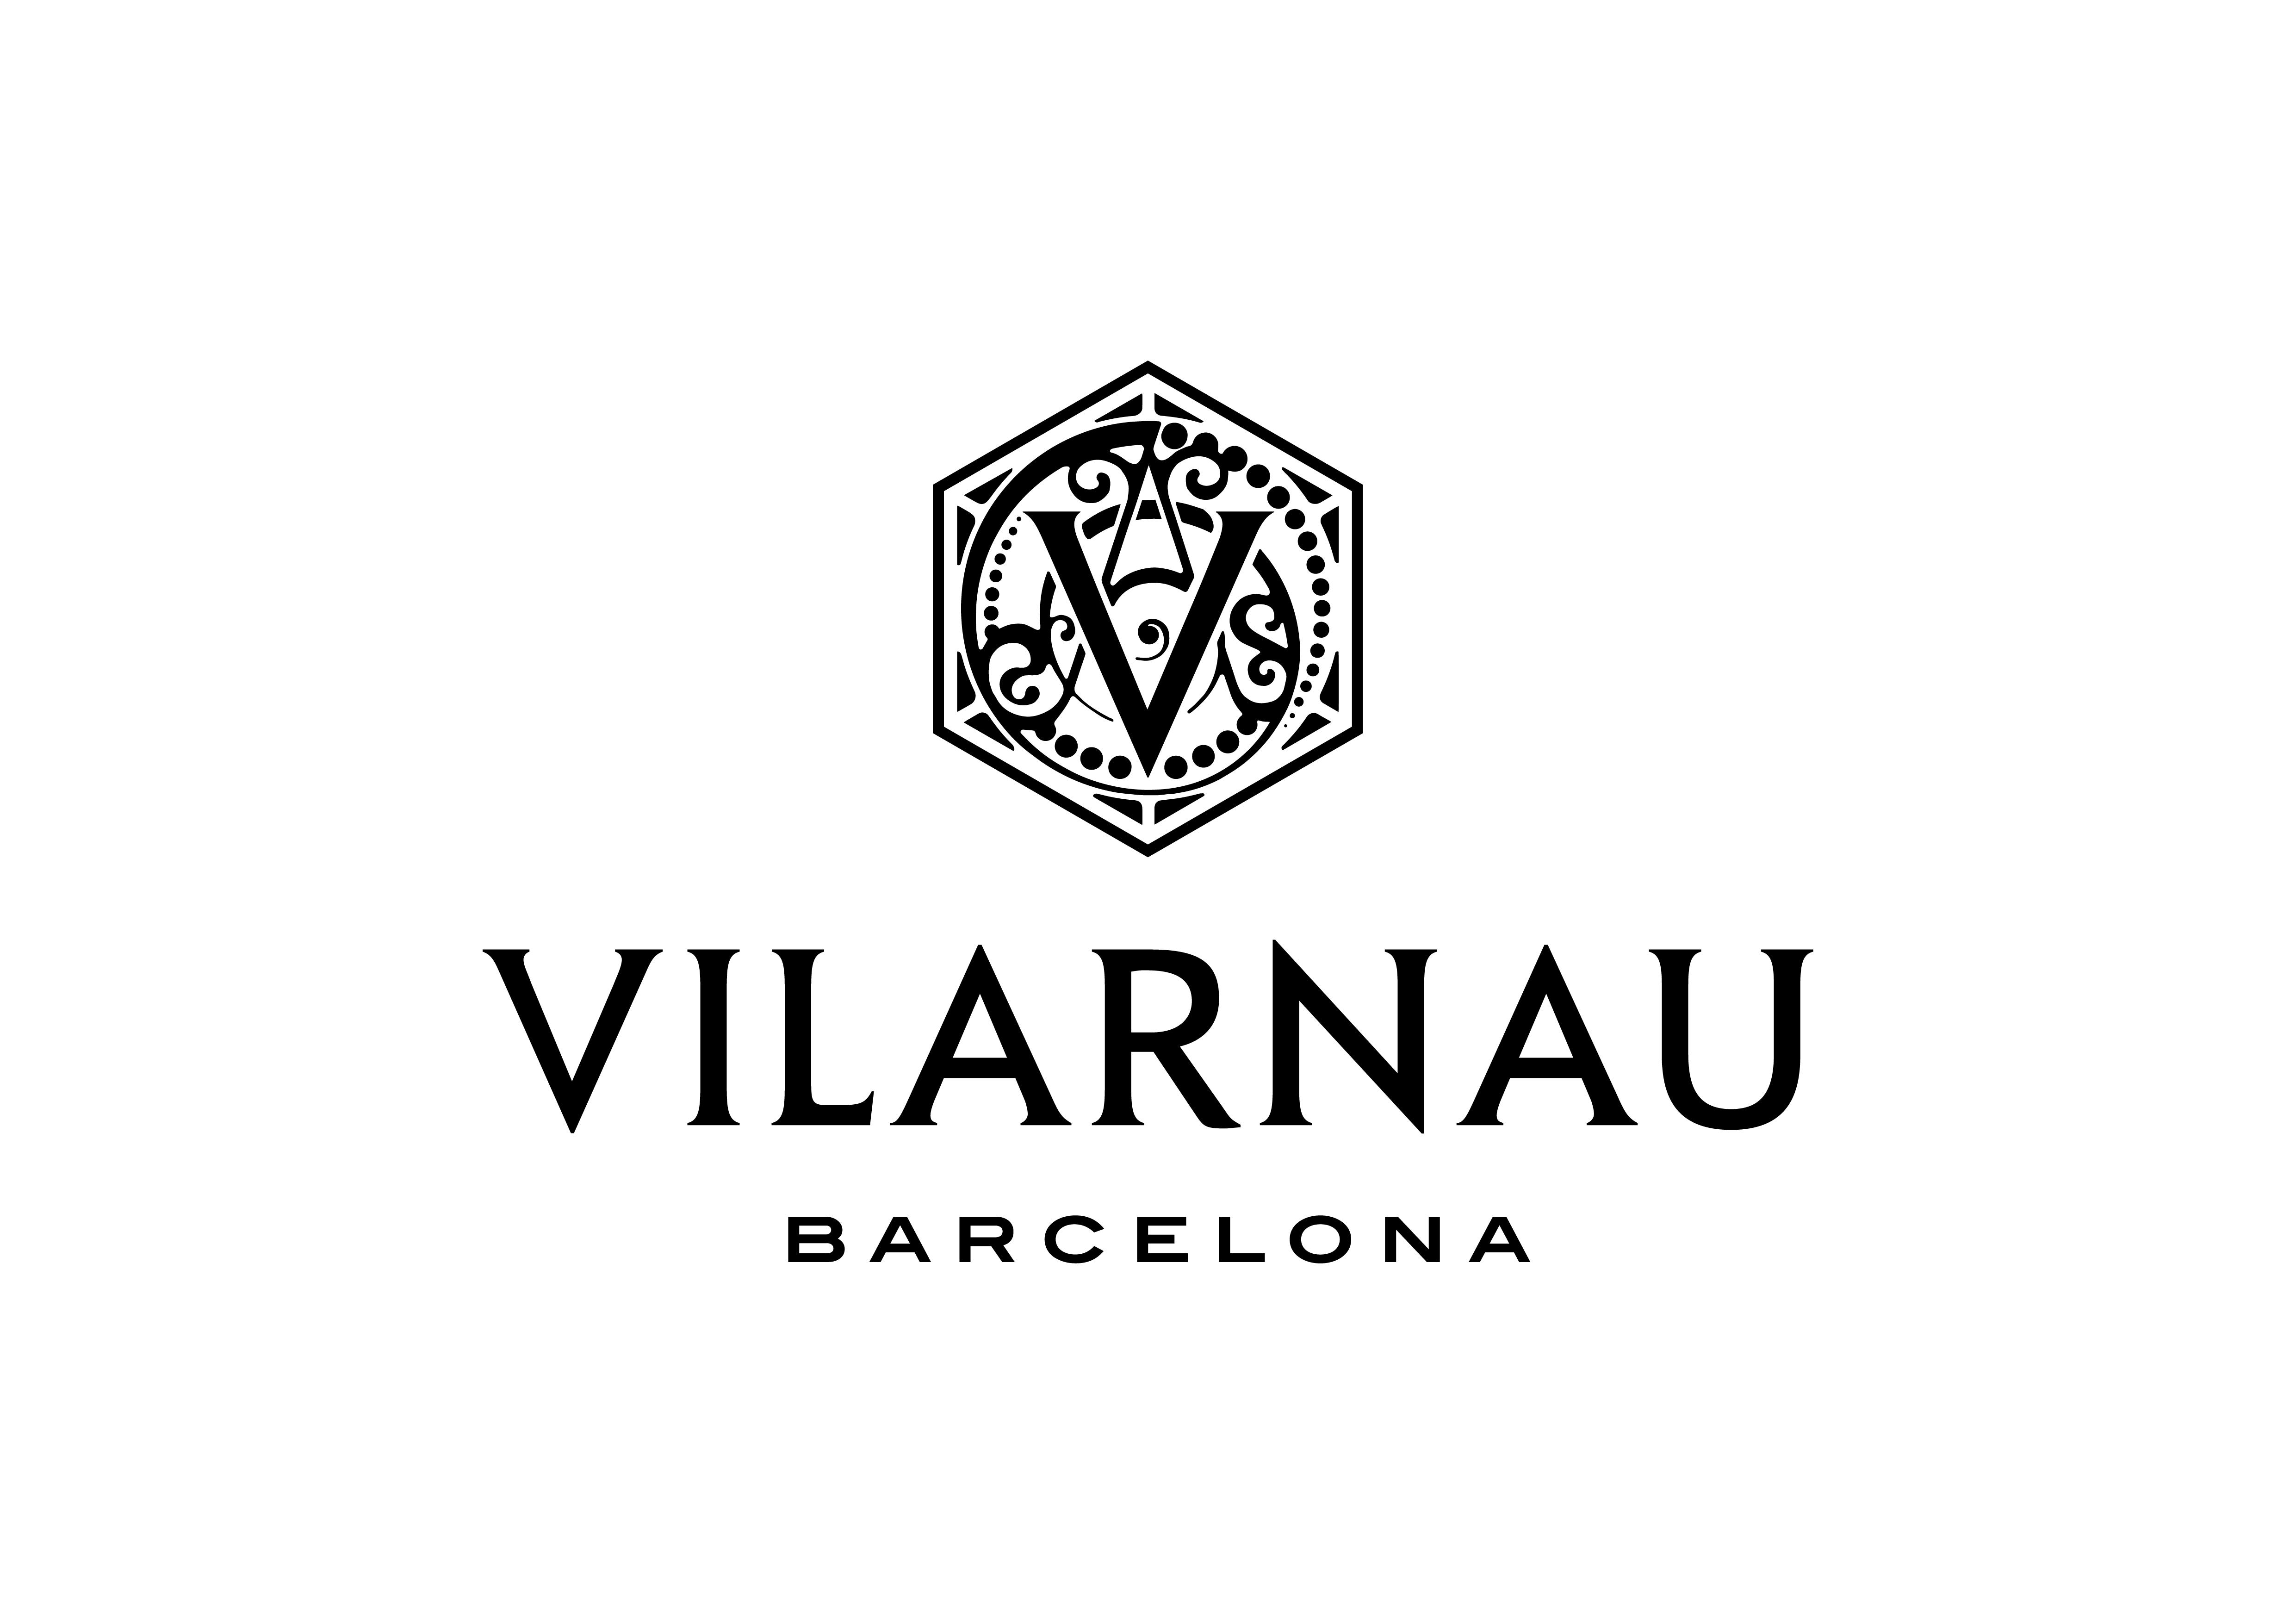 Vilarnau new logo